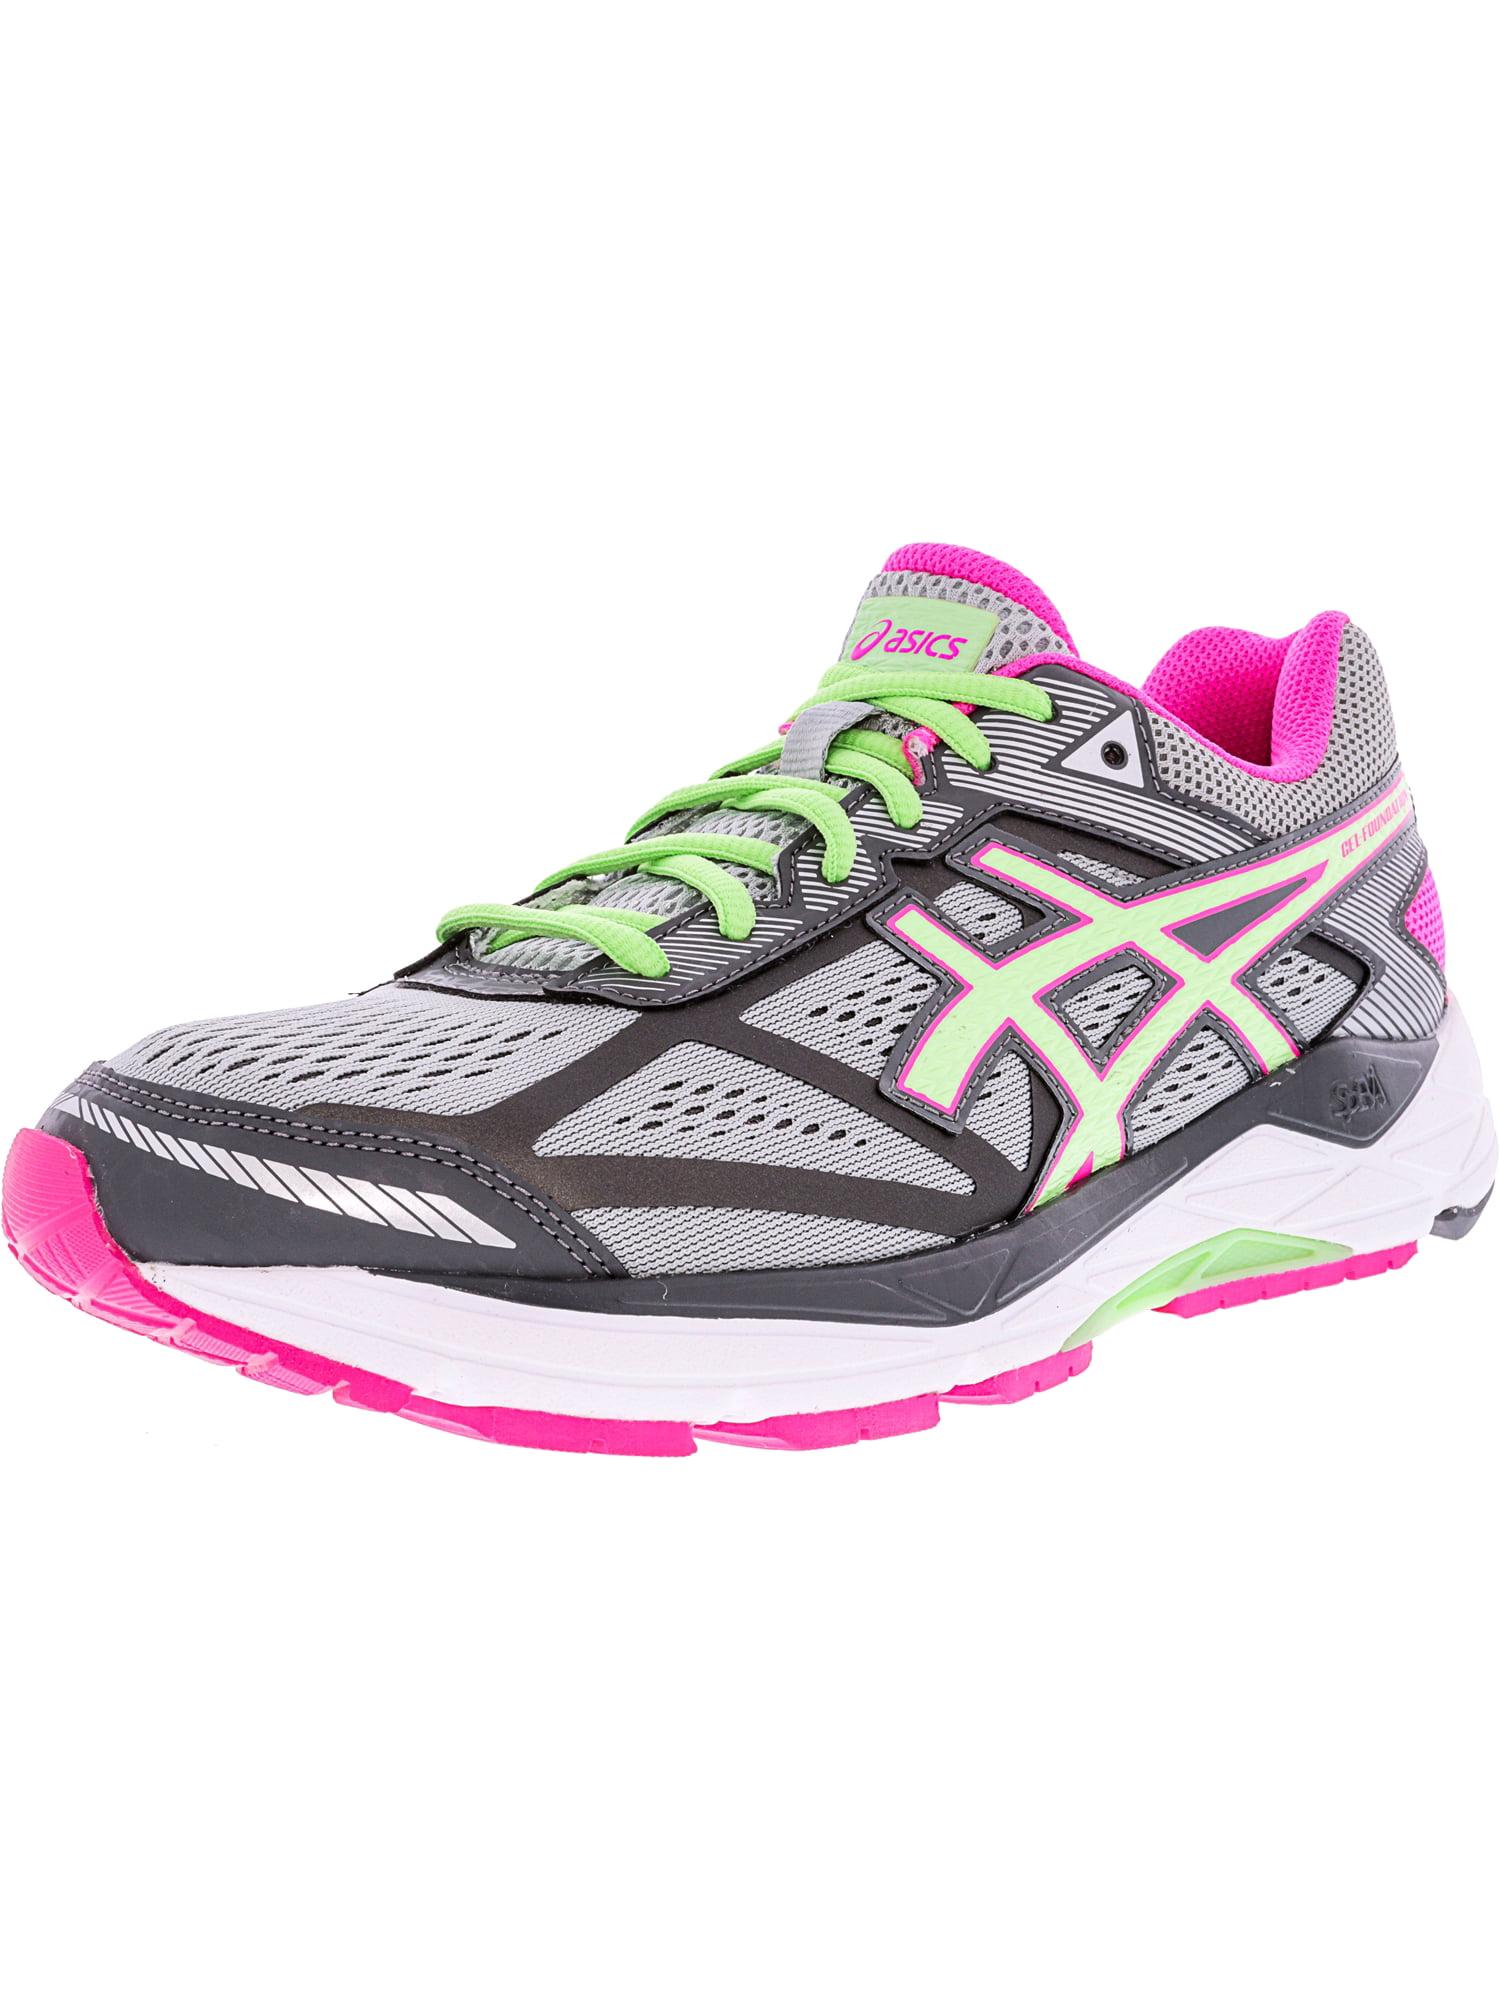 Asics Women's Gel-Foundation 12 Silver Grey / Pistachio Pink Glow Ankle-High Running Shoe - 8M